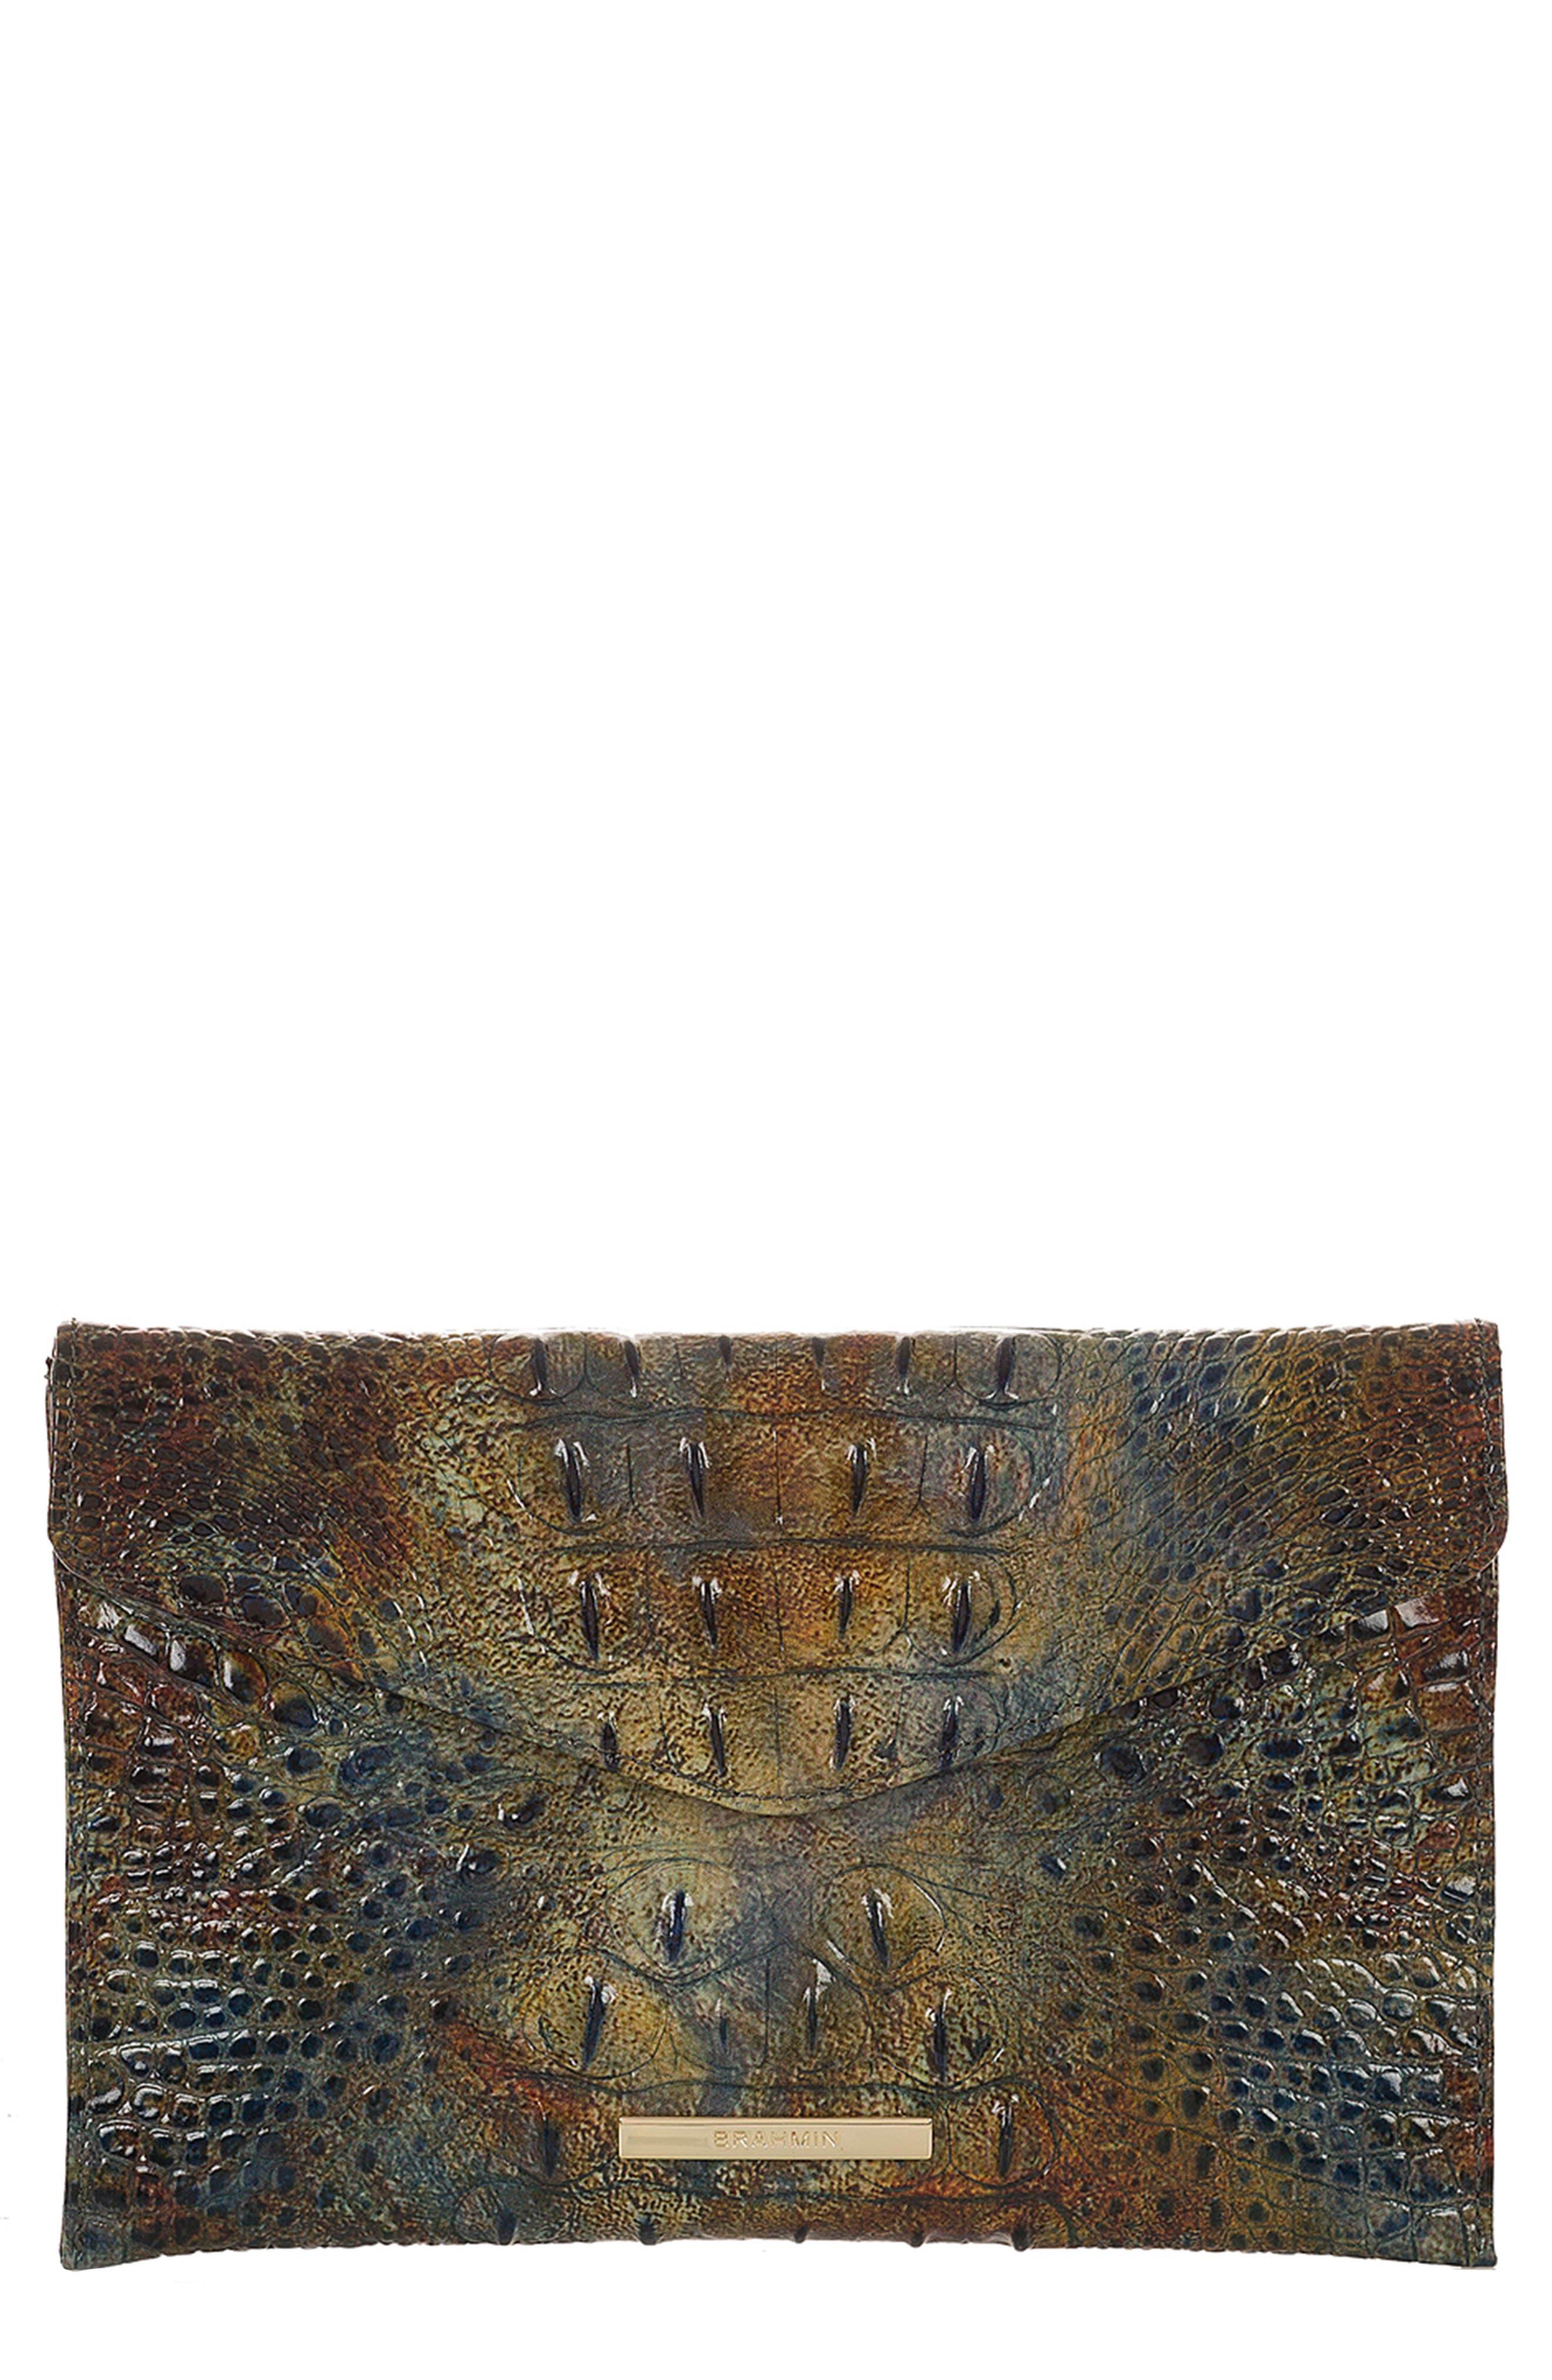 BRAHMIN,                             Melbourne Croc Embossed Leather Envelope Clutch,                             Main thumbnail 1, color,                             204